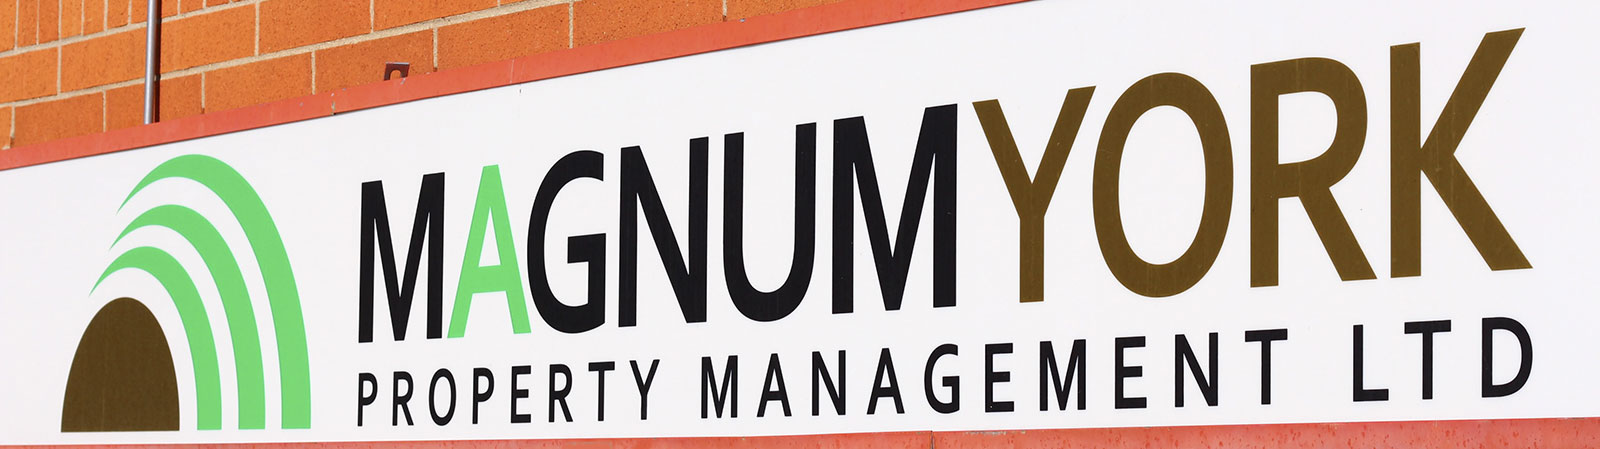 inside look magnum york property managers logo brick building blog post